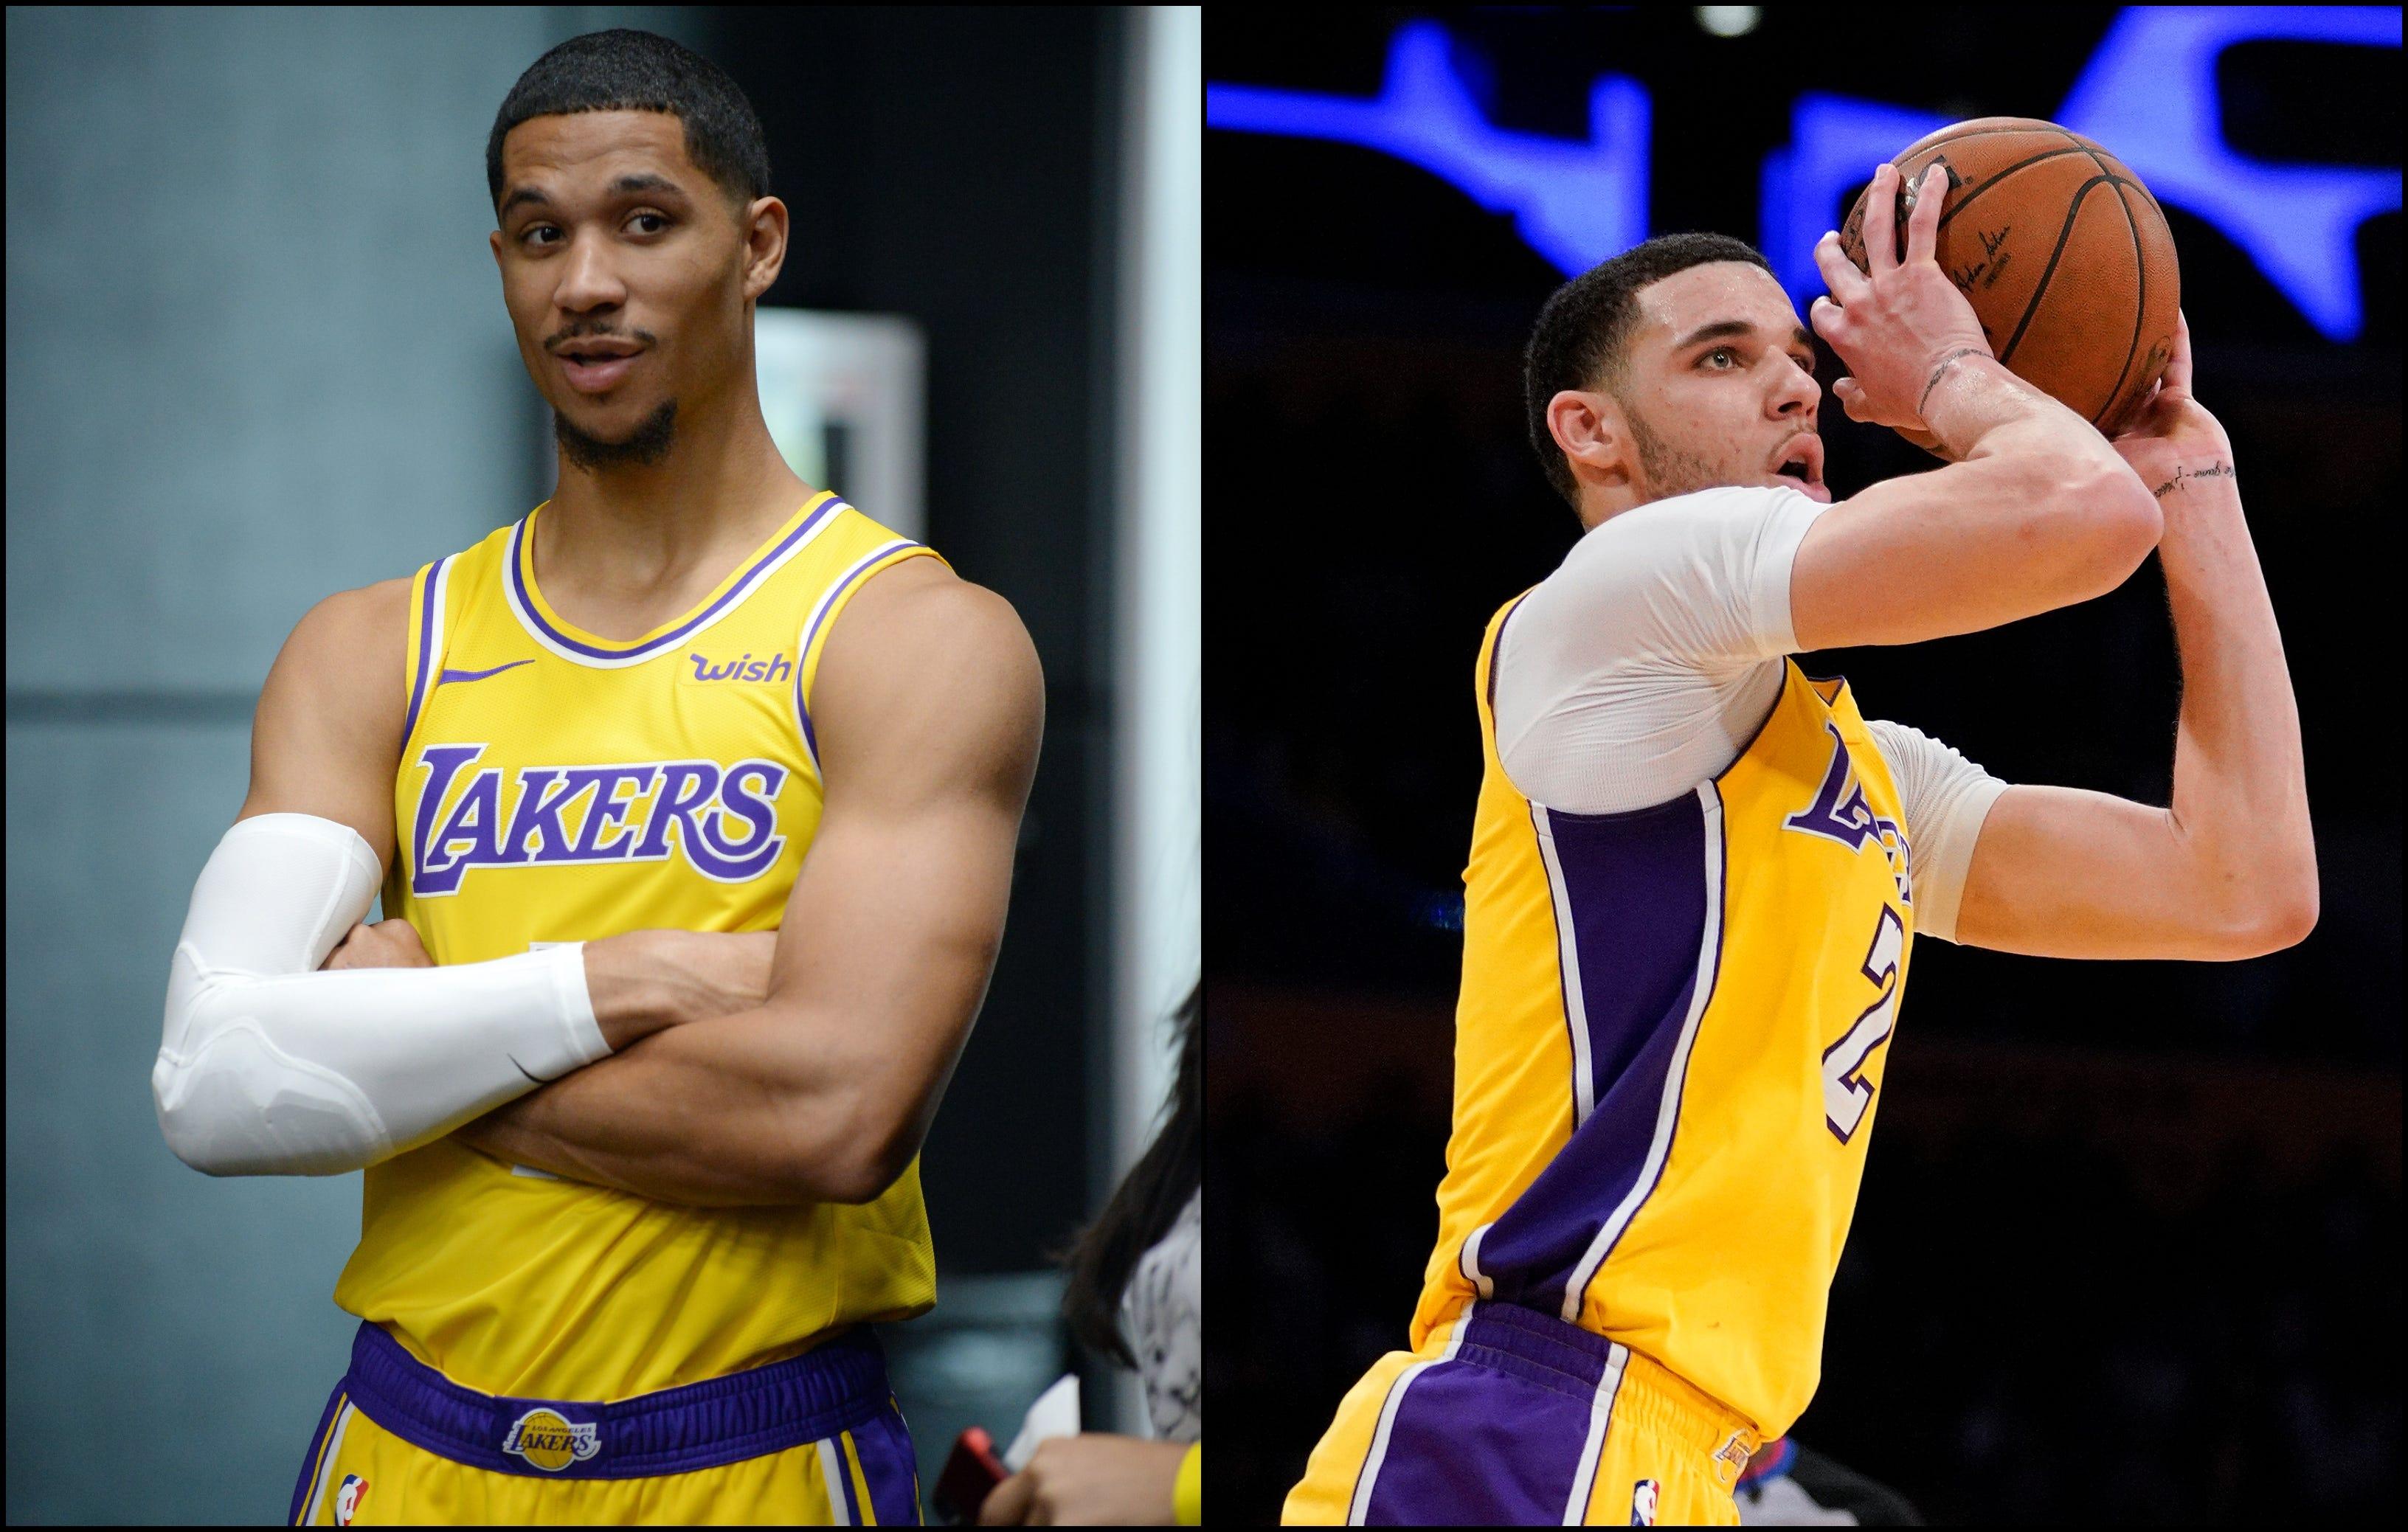 Lakers: Josh Hart mocks Lonzo Ball's airballed 3-pointer